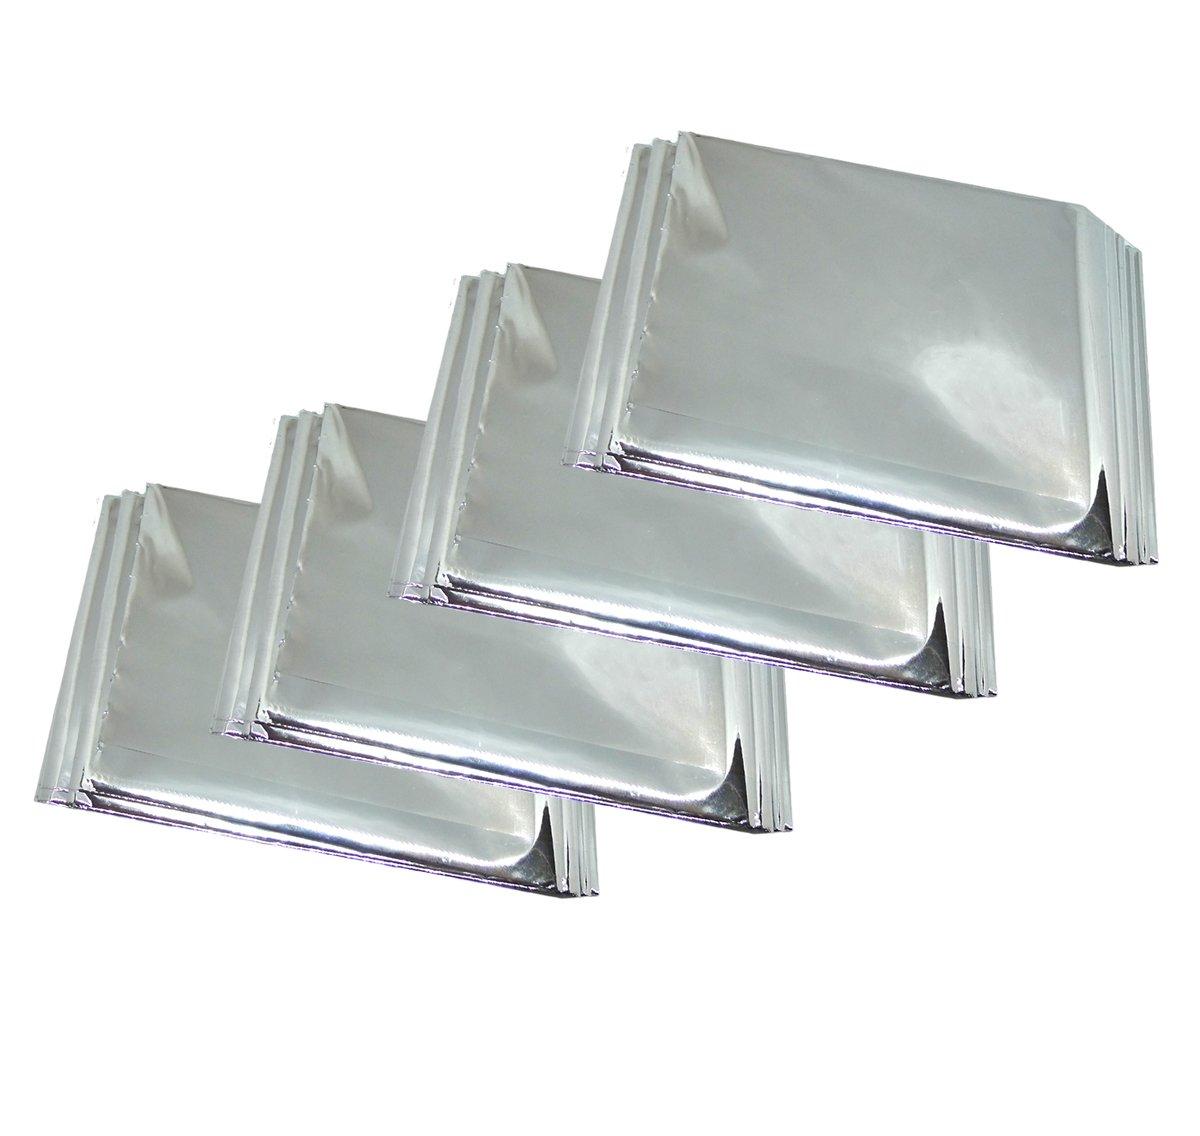 Faocean 4 Packs 52'' x 82'' Reflective Emergency Survival Mylar Blanket Heat Tent Cover, Silver